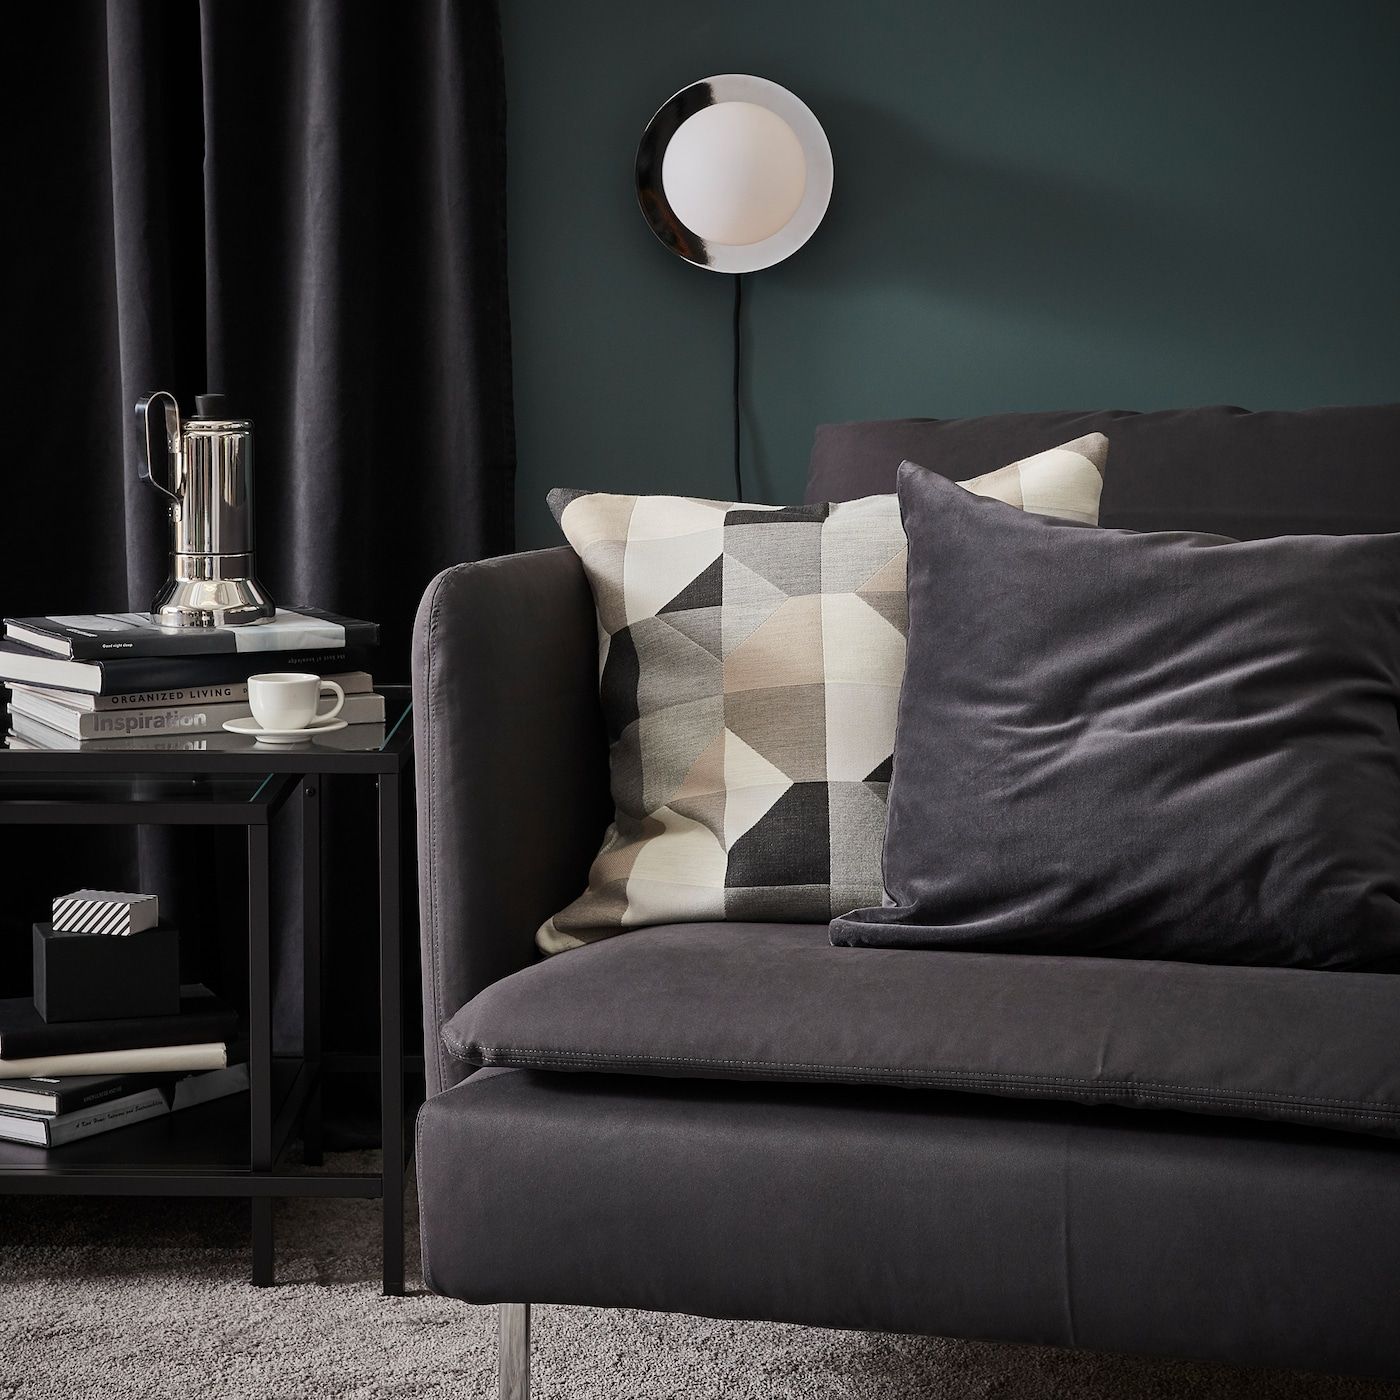 Simrishamn Lampada Da Tavolo Parete Cromato Bianco Opalino Vetro 16 Cm Ikea It